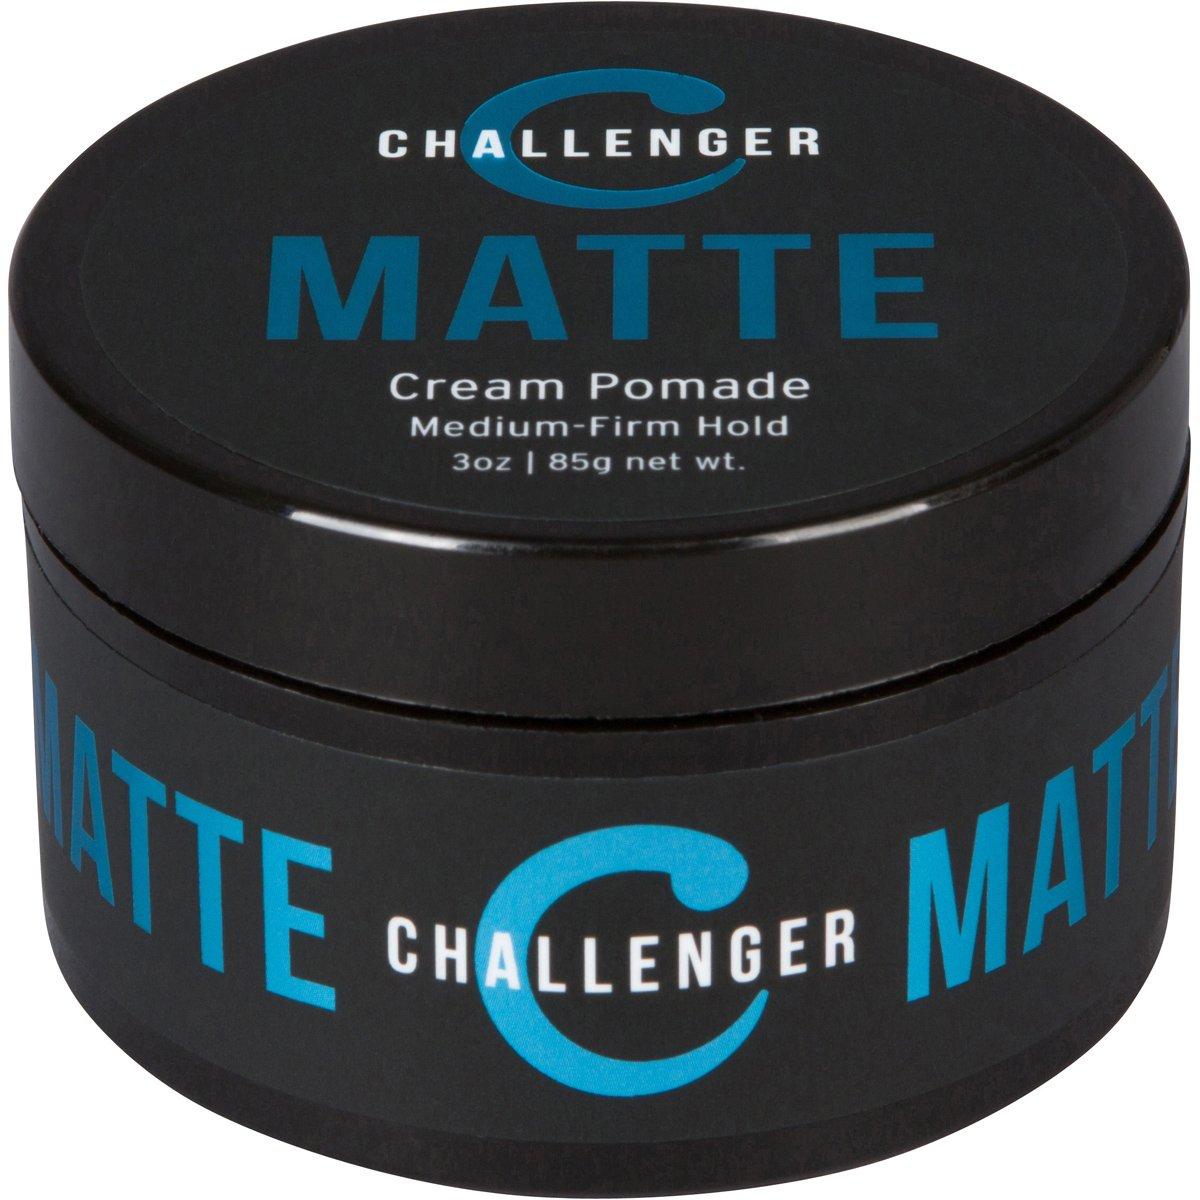 Challenger Matte Cream Pomade